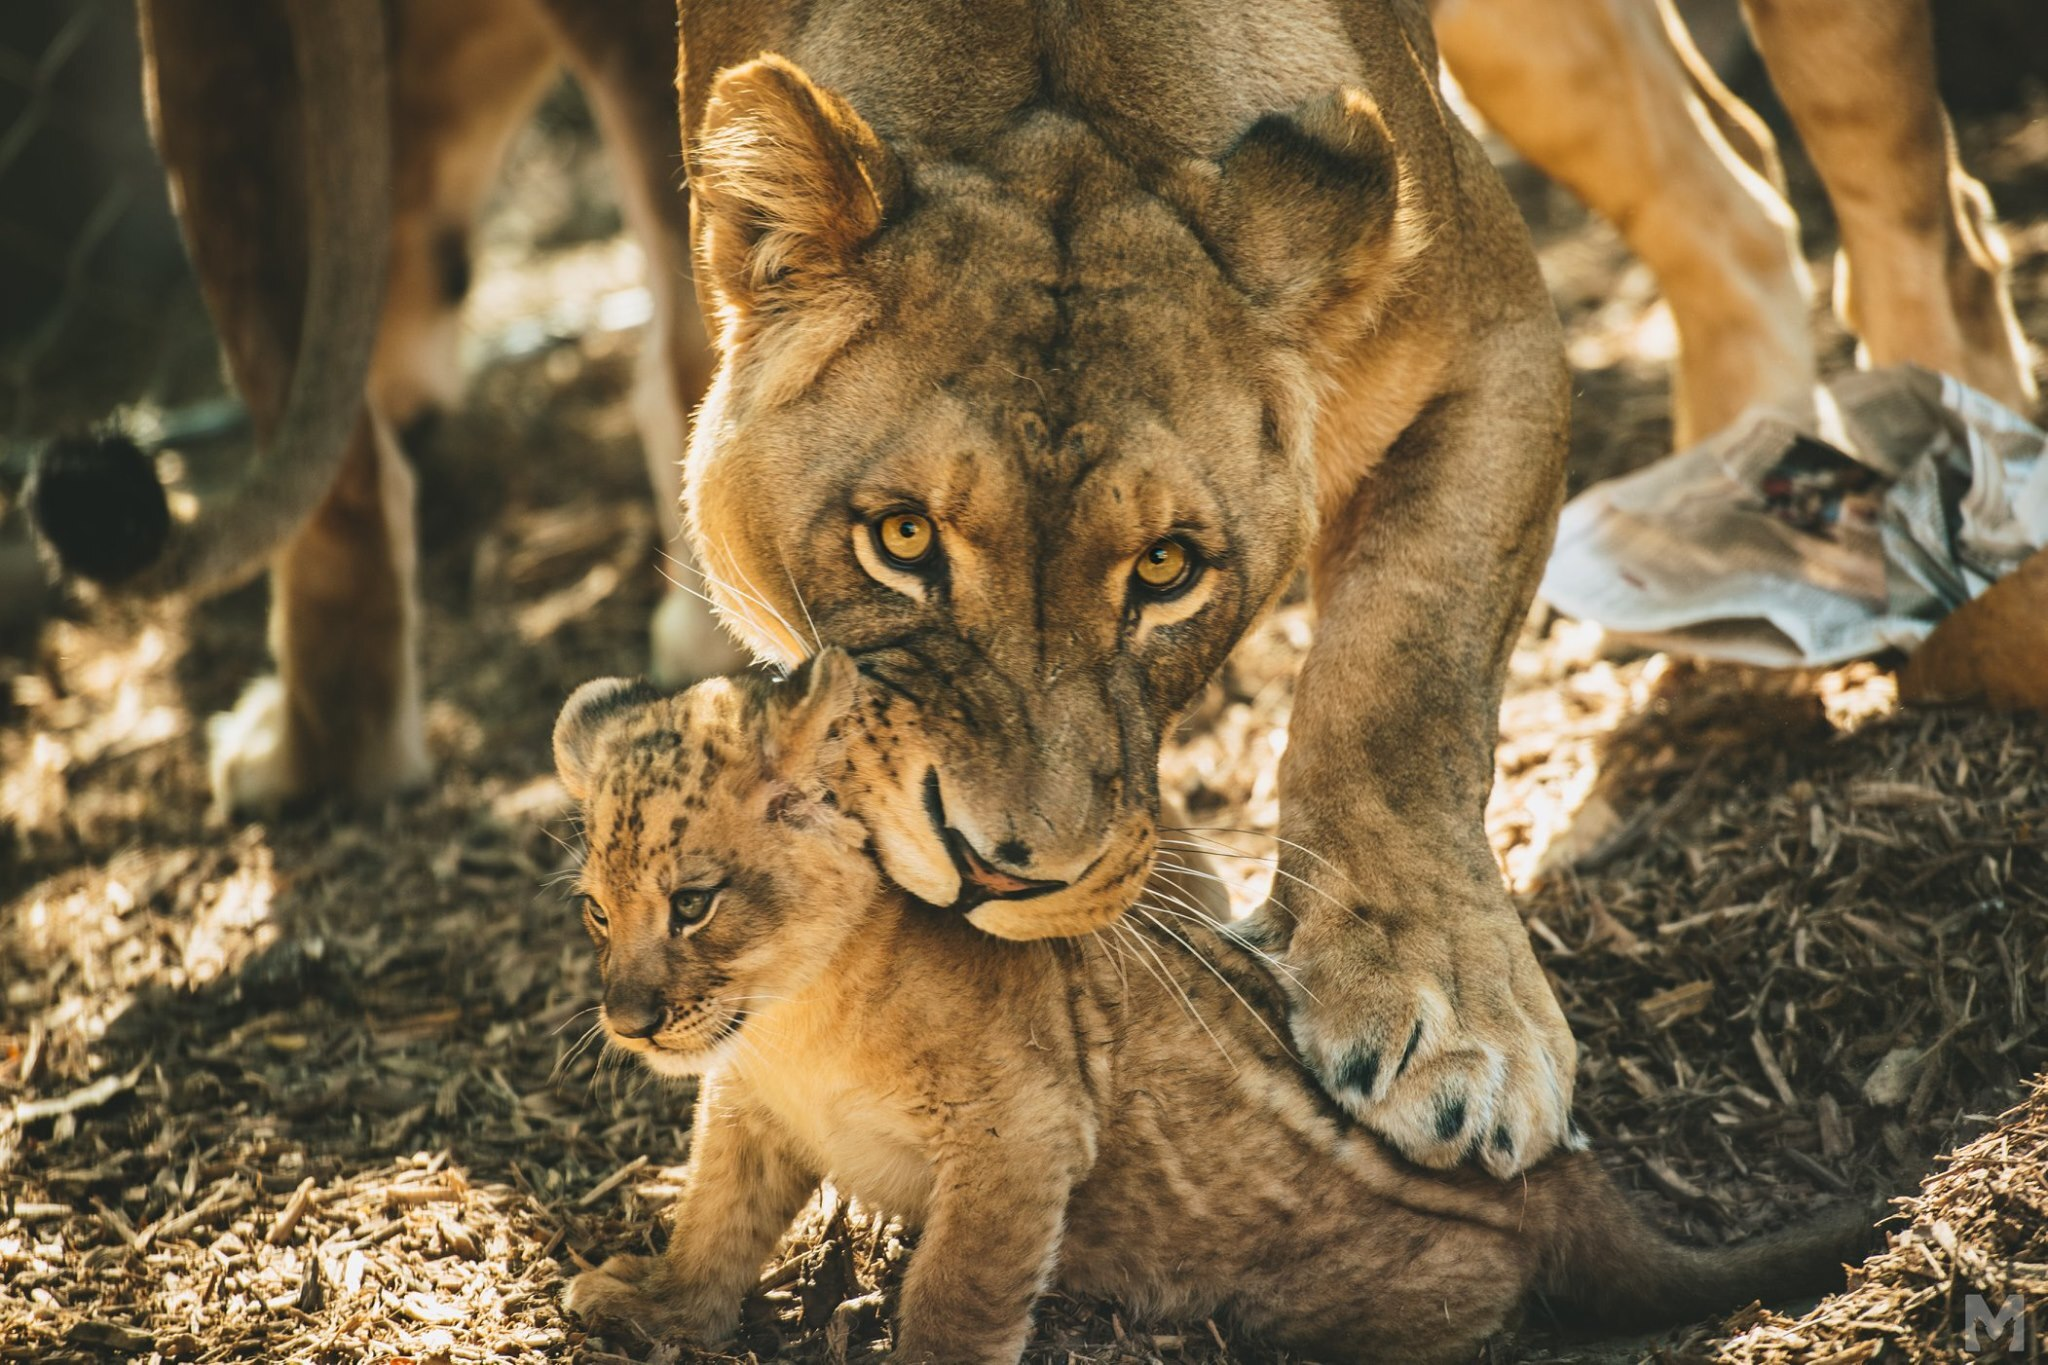 Lion Cub_3_Molly McCormick.jpg